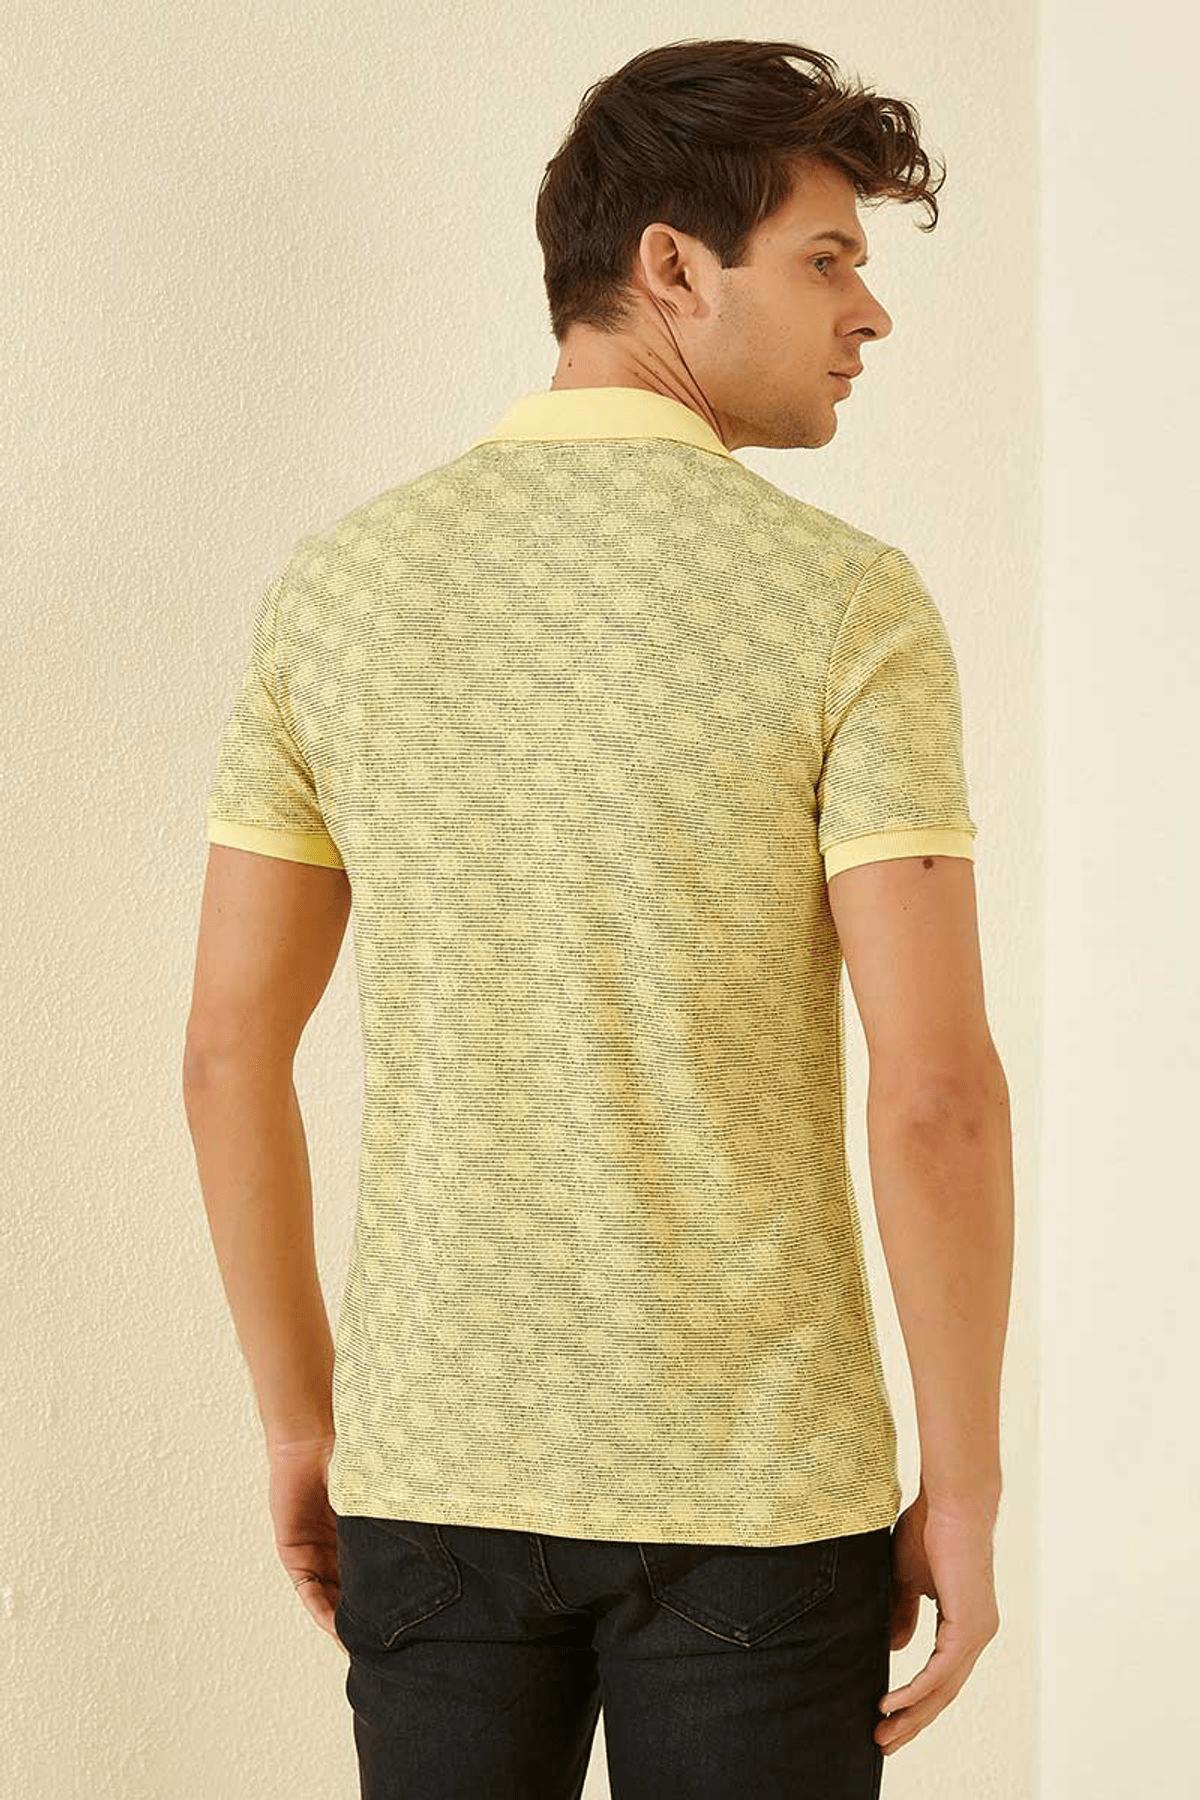 Tommy Life Baskılı Polo Yaka Sarı Erkek T-Shirt T08ER-87796_1 3